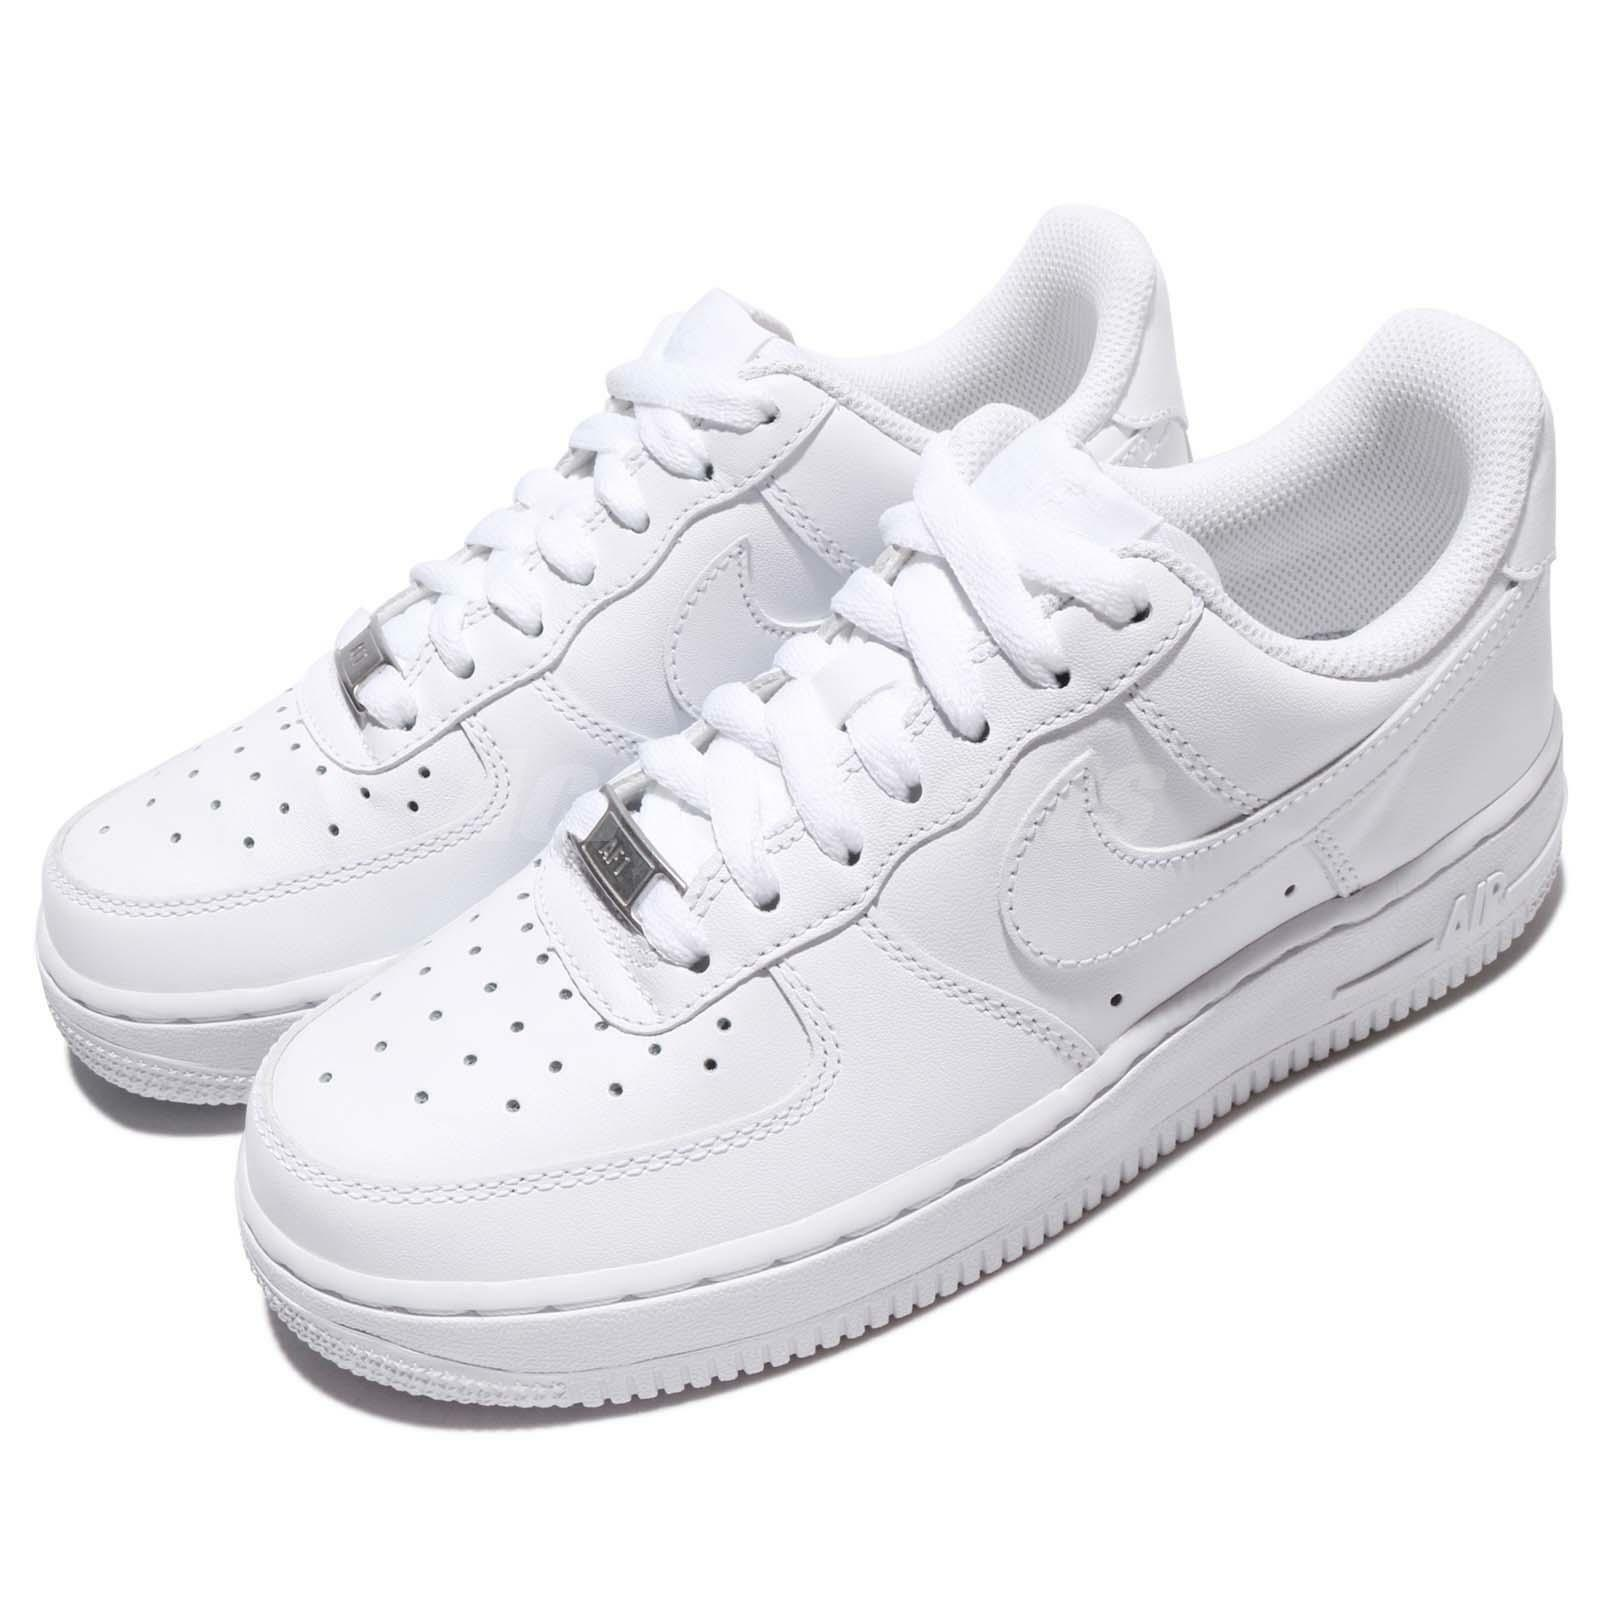 Wmns Nike Air Force 1 07 Zapatos Tenis blancoout blancoout blancoout para mujeres Clásico AF1 315115-112  excelentes precios